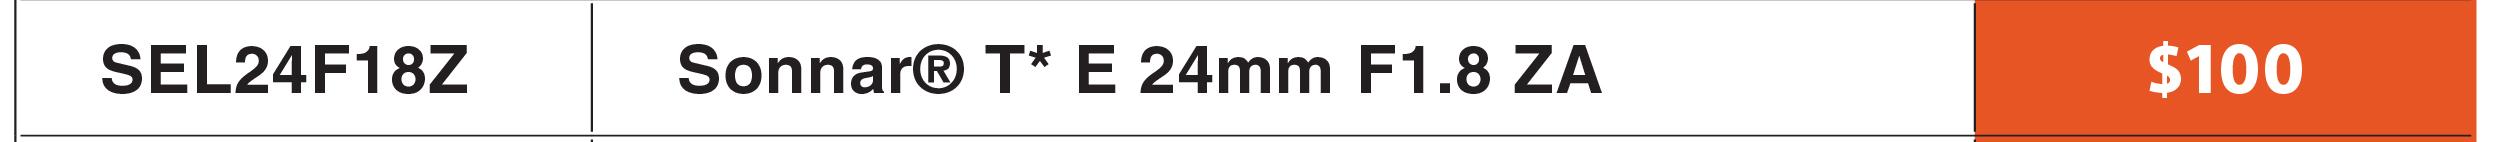 Sony 24mm f/1.8 Lens